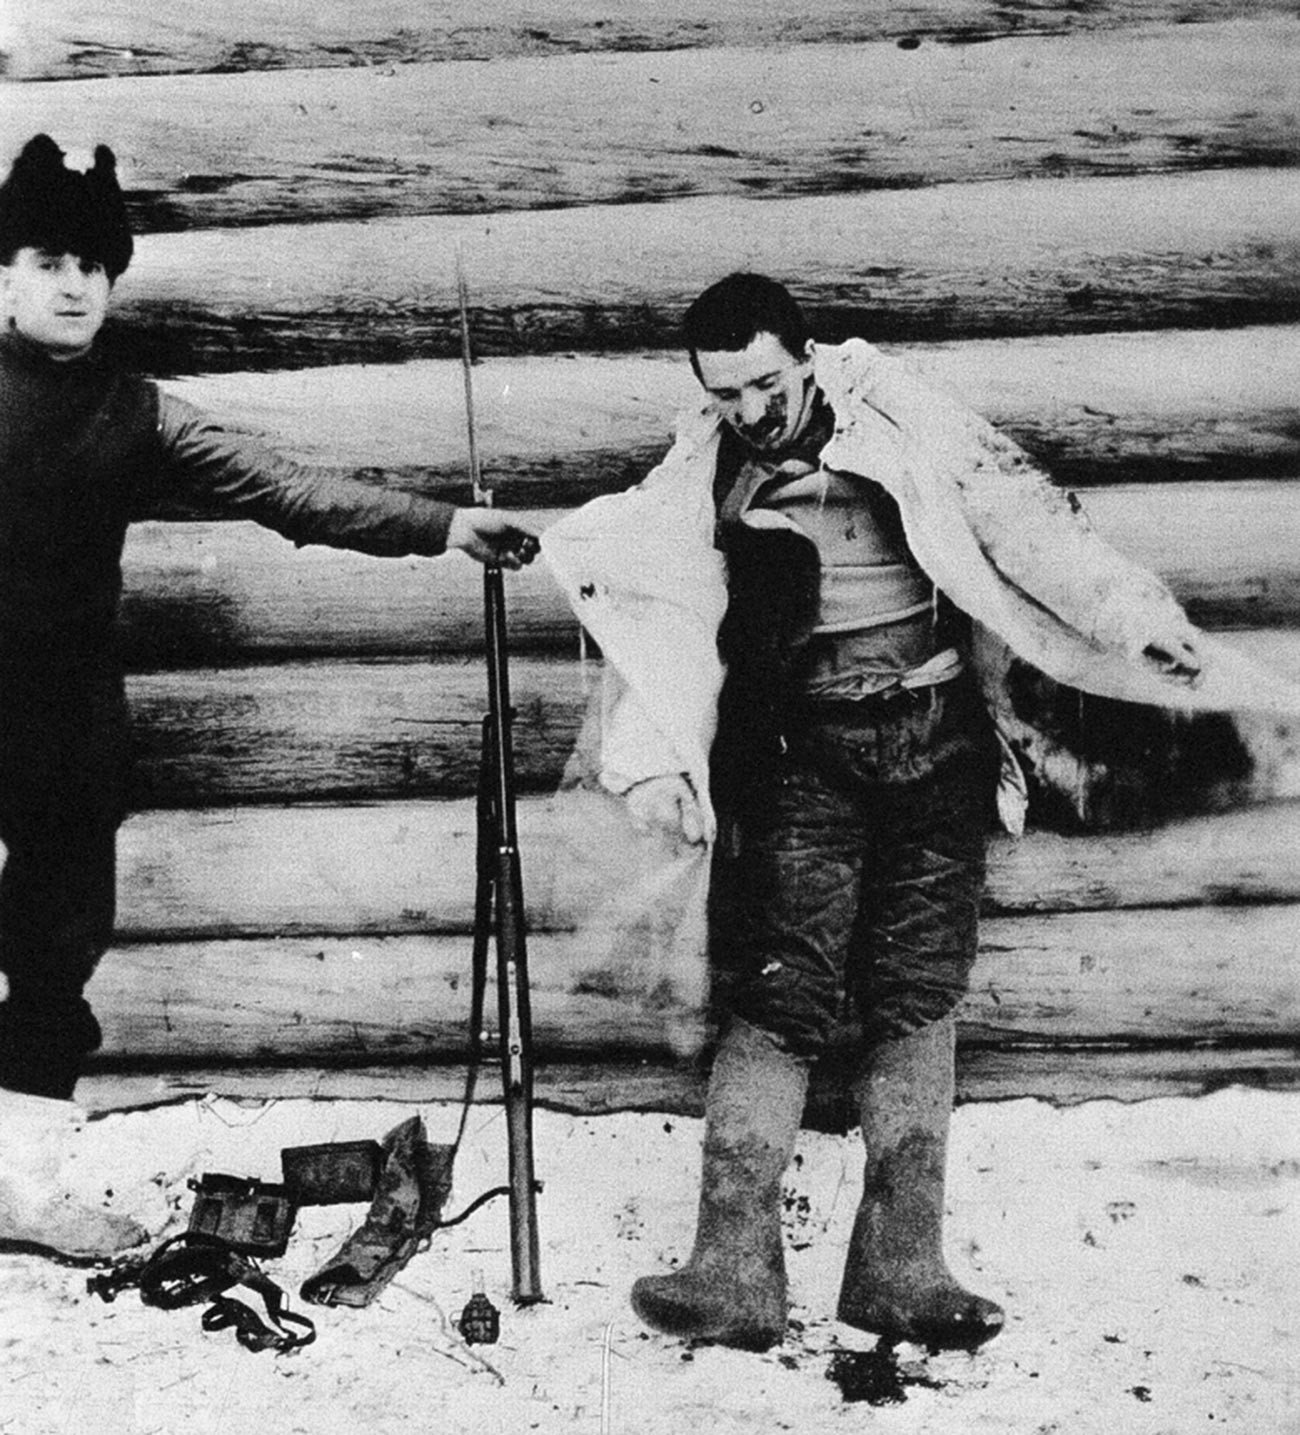 A Bolshevik shot by an American guard.